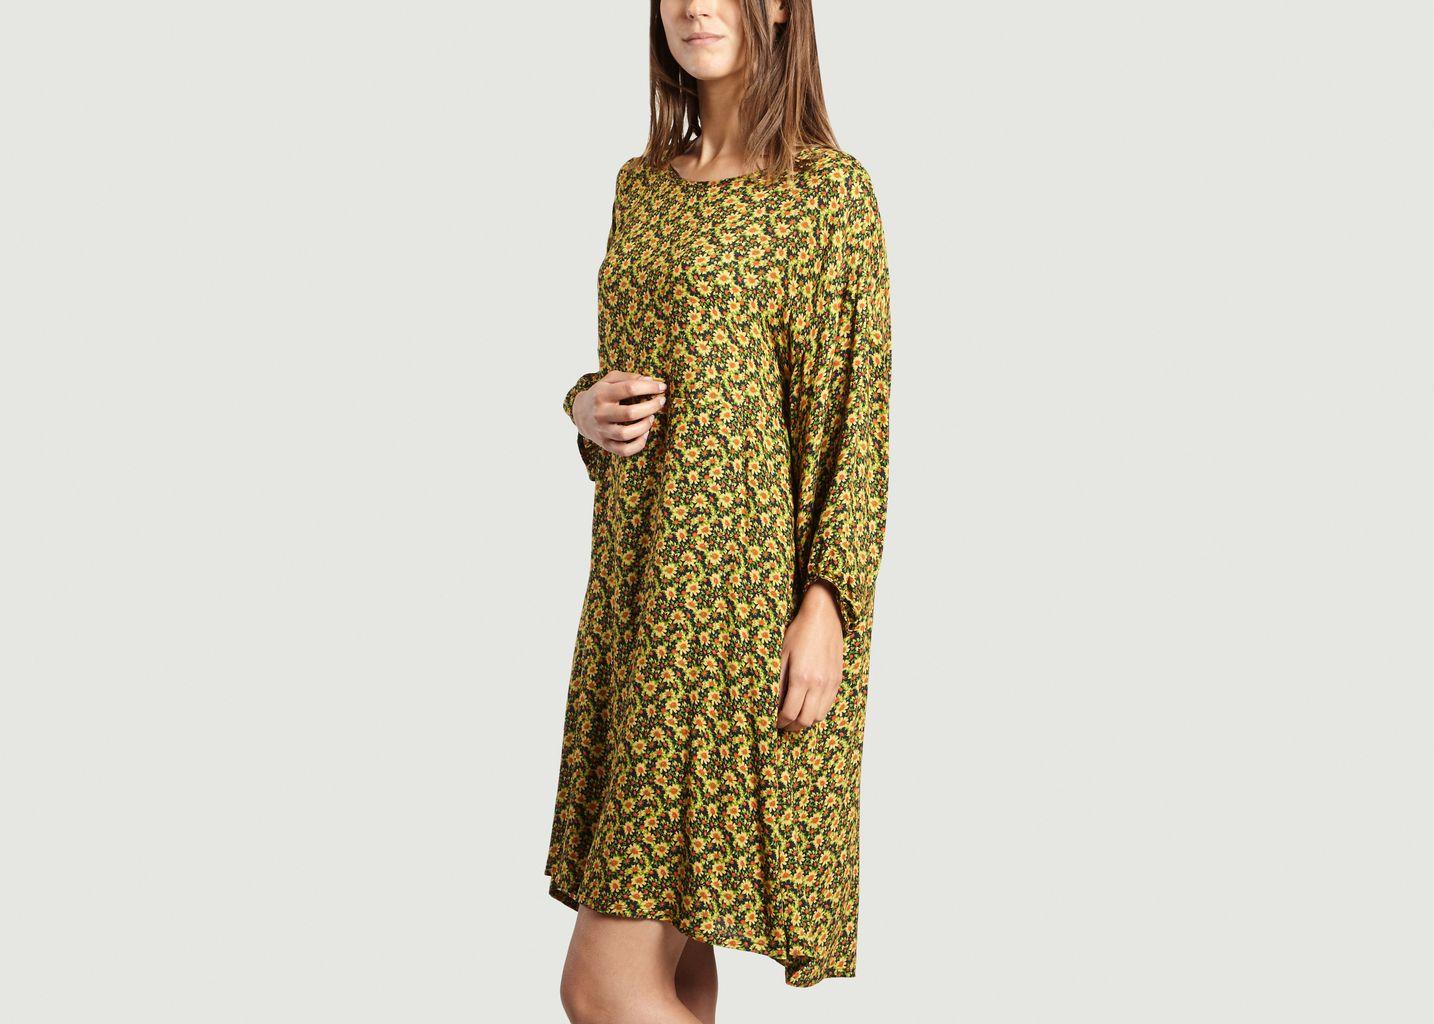 robe doggywood american vintage jaune l 39 exception. Black Bedroom Furniture Sets. Home Design Ideas